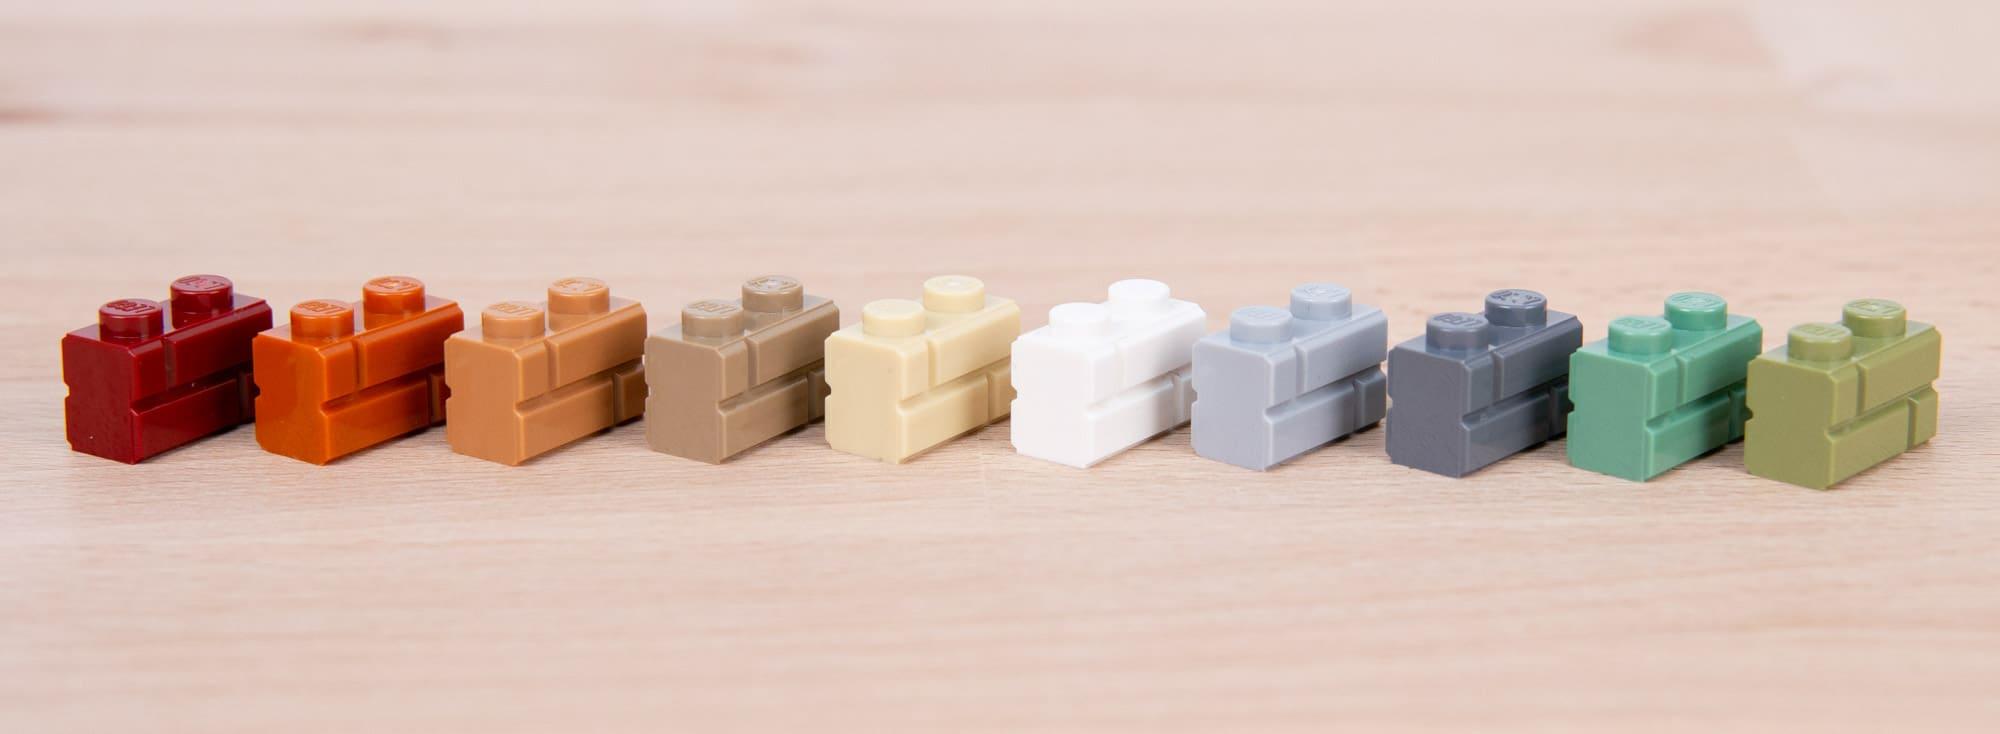 LEGO 1x2 Masonry Brick Weiß 5